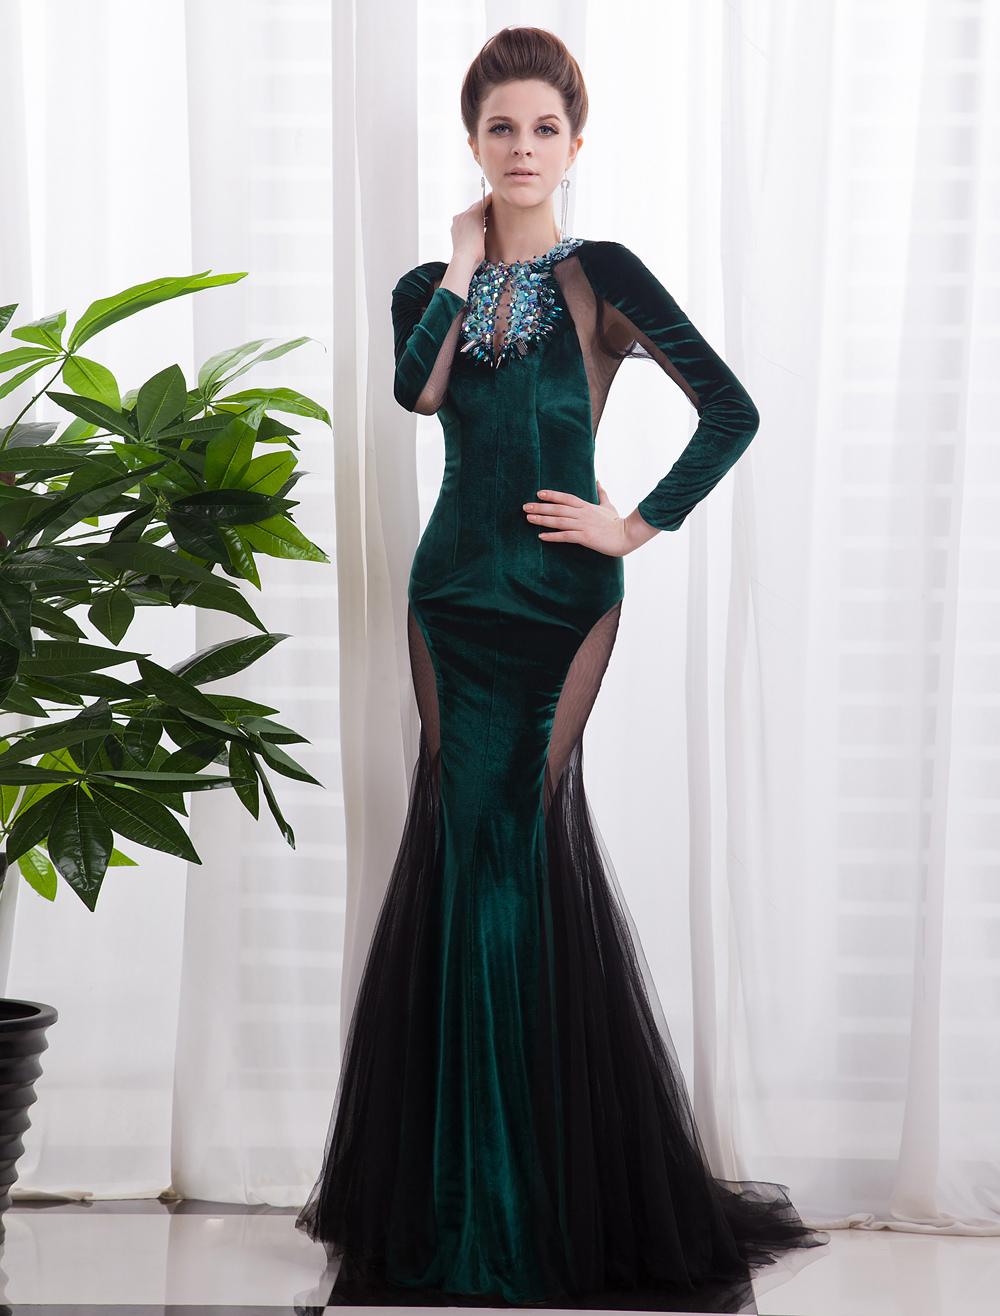 Dark Green Cut Out Mermaid Velvet Evening Dress with Jewel Neck Long Sleeves Milanoo (Wedding Evening Dresses) photo